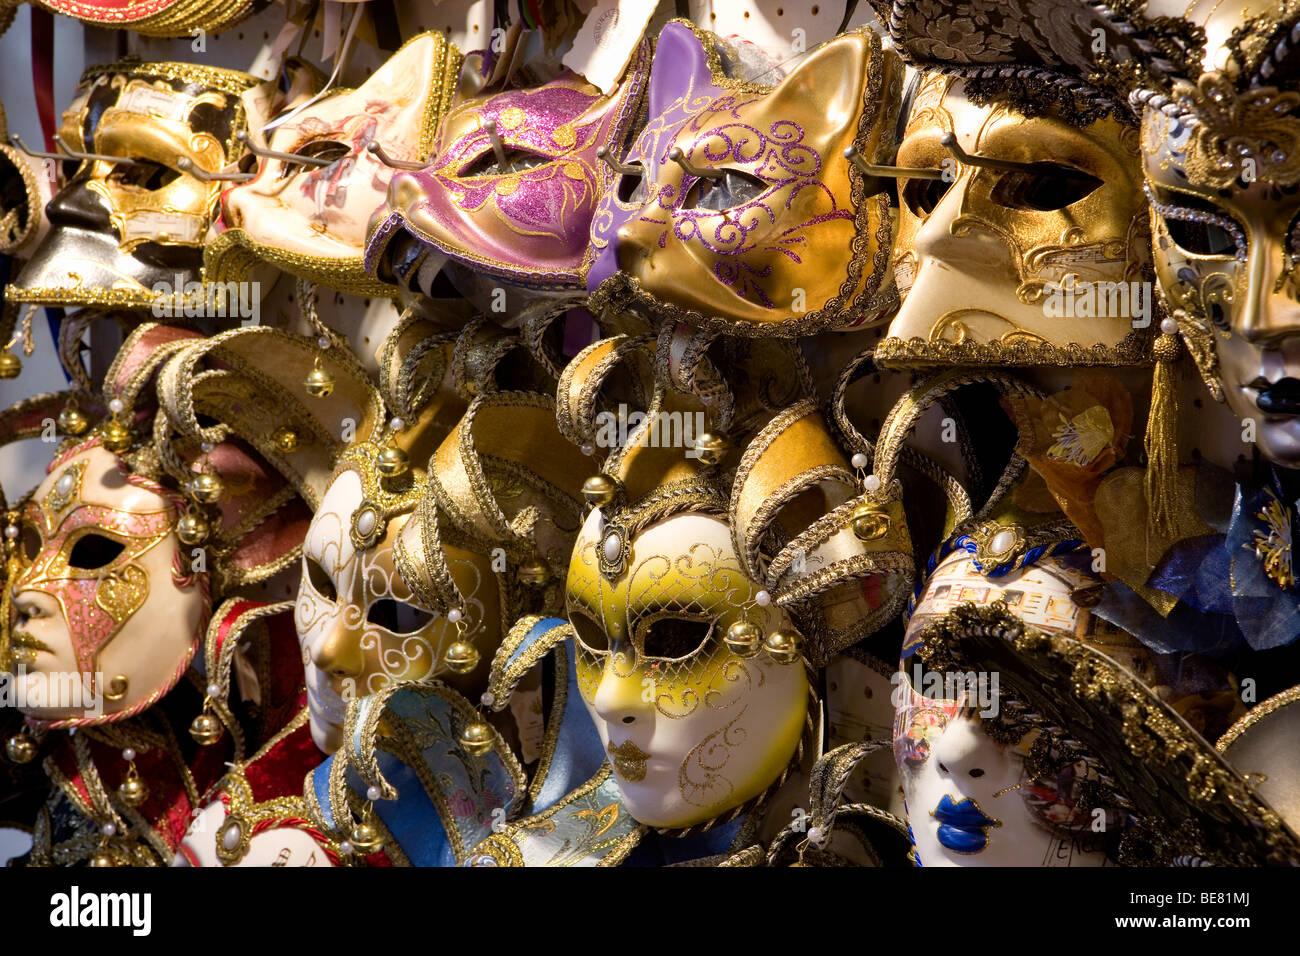 detail des venezianischen karneval masken venedig italien europa stockfoto bild 25992530. Black Bedroom Furniture Sets. Home Design Ideas